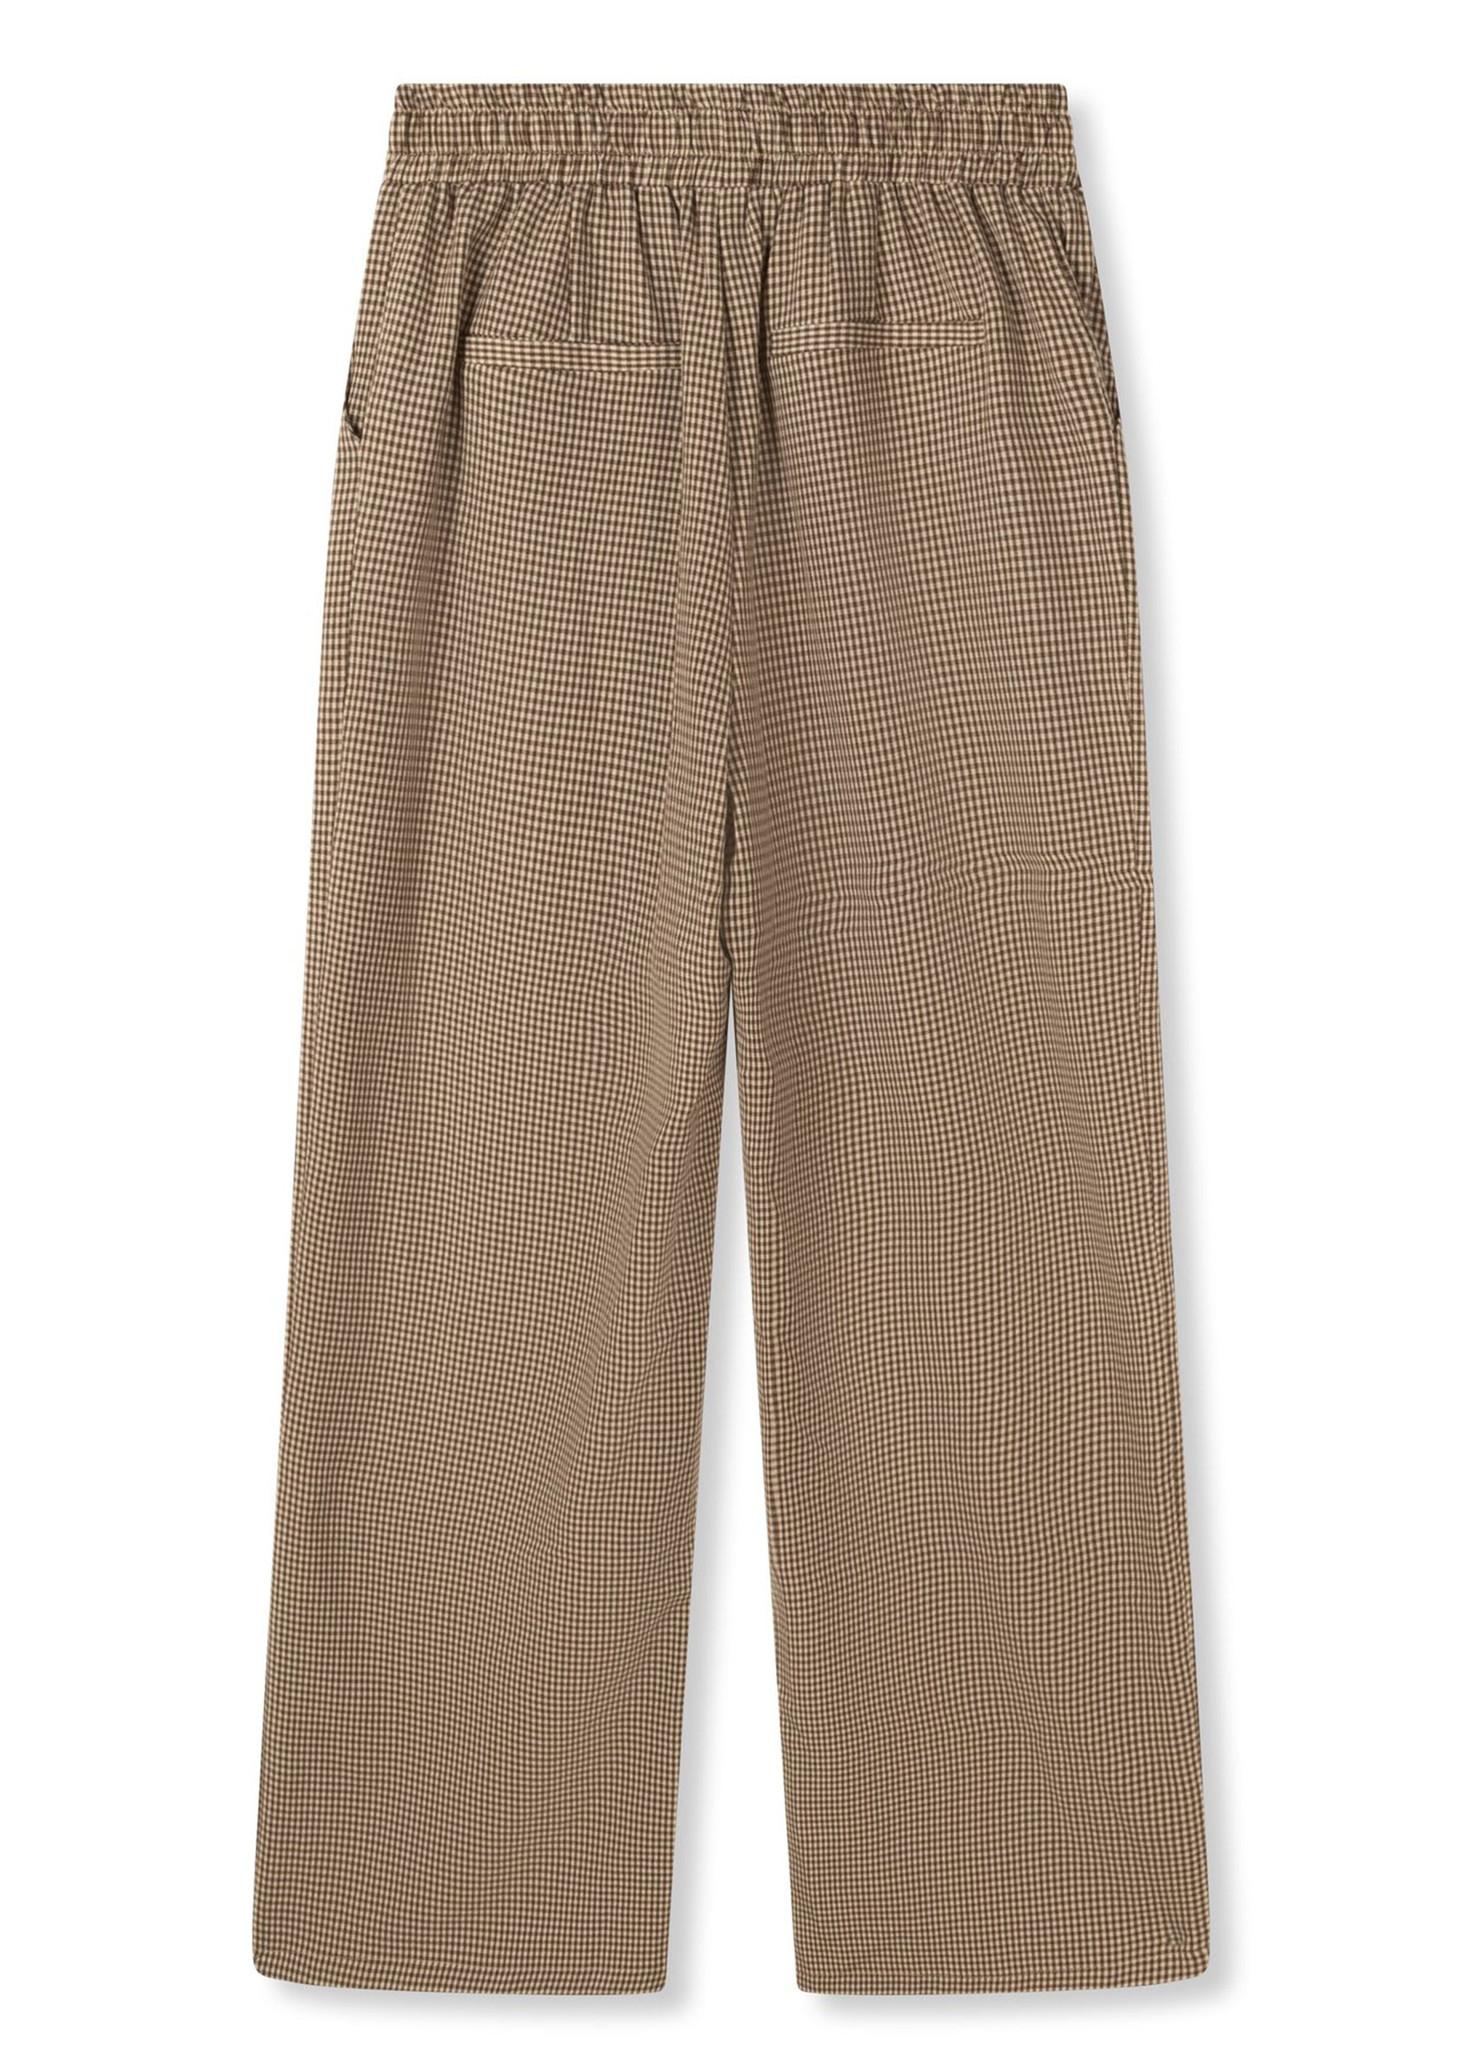 Woven Check Pants-2